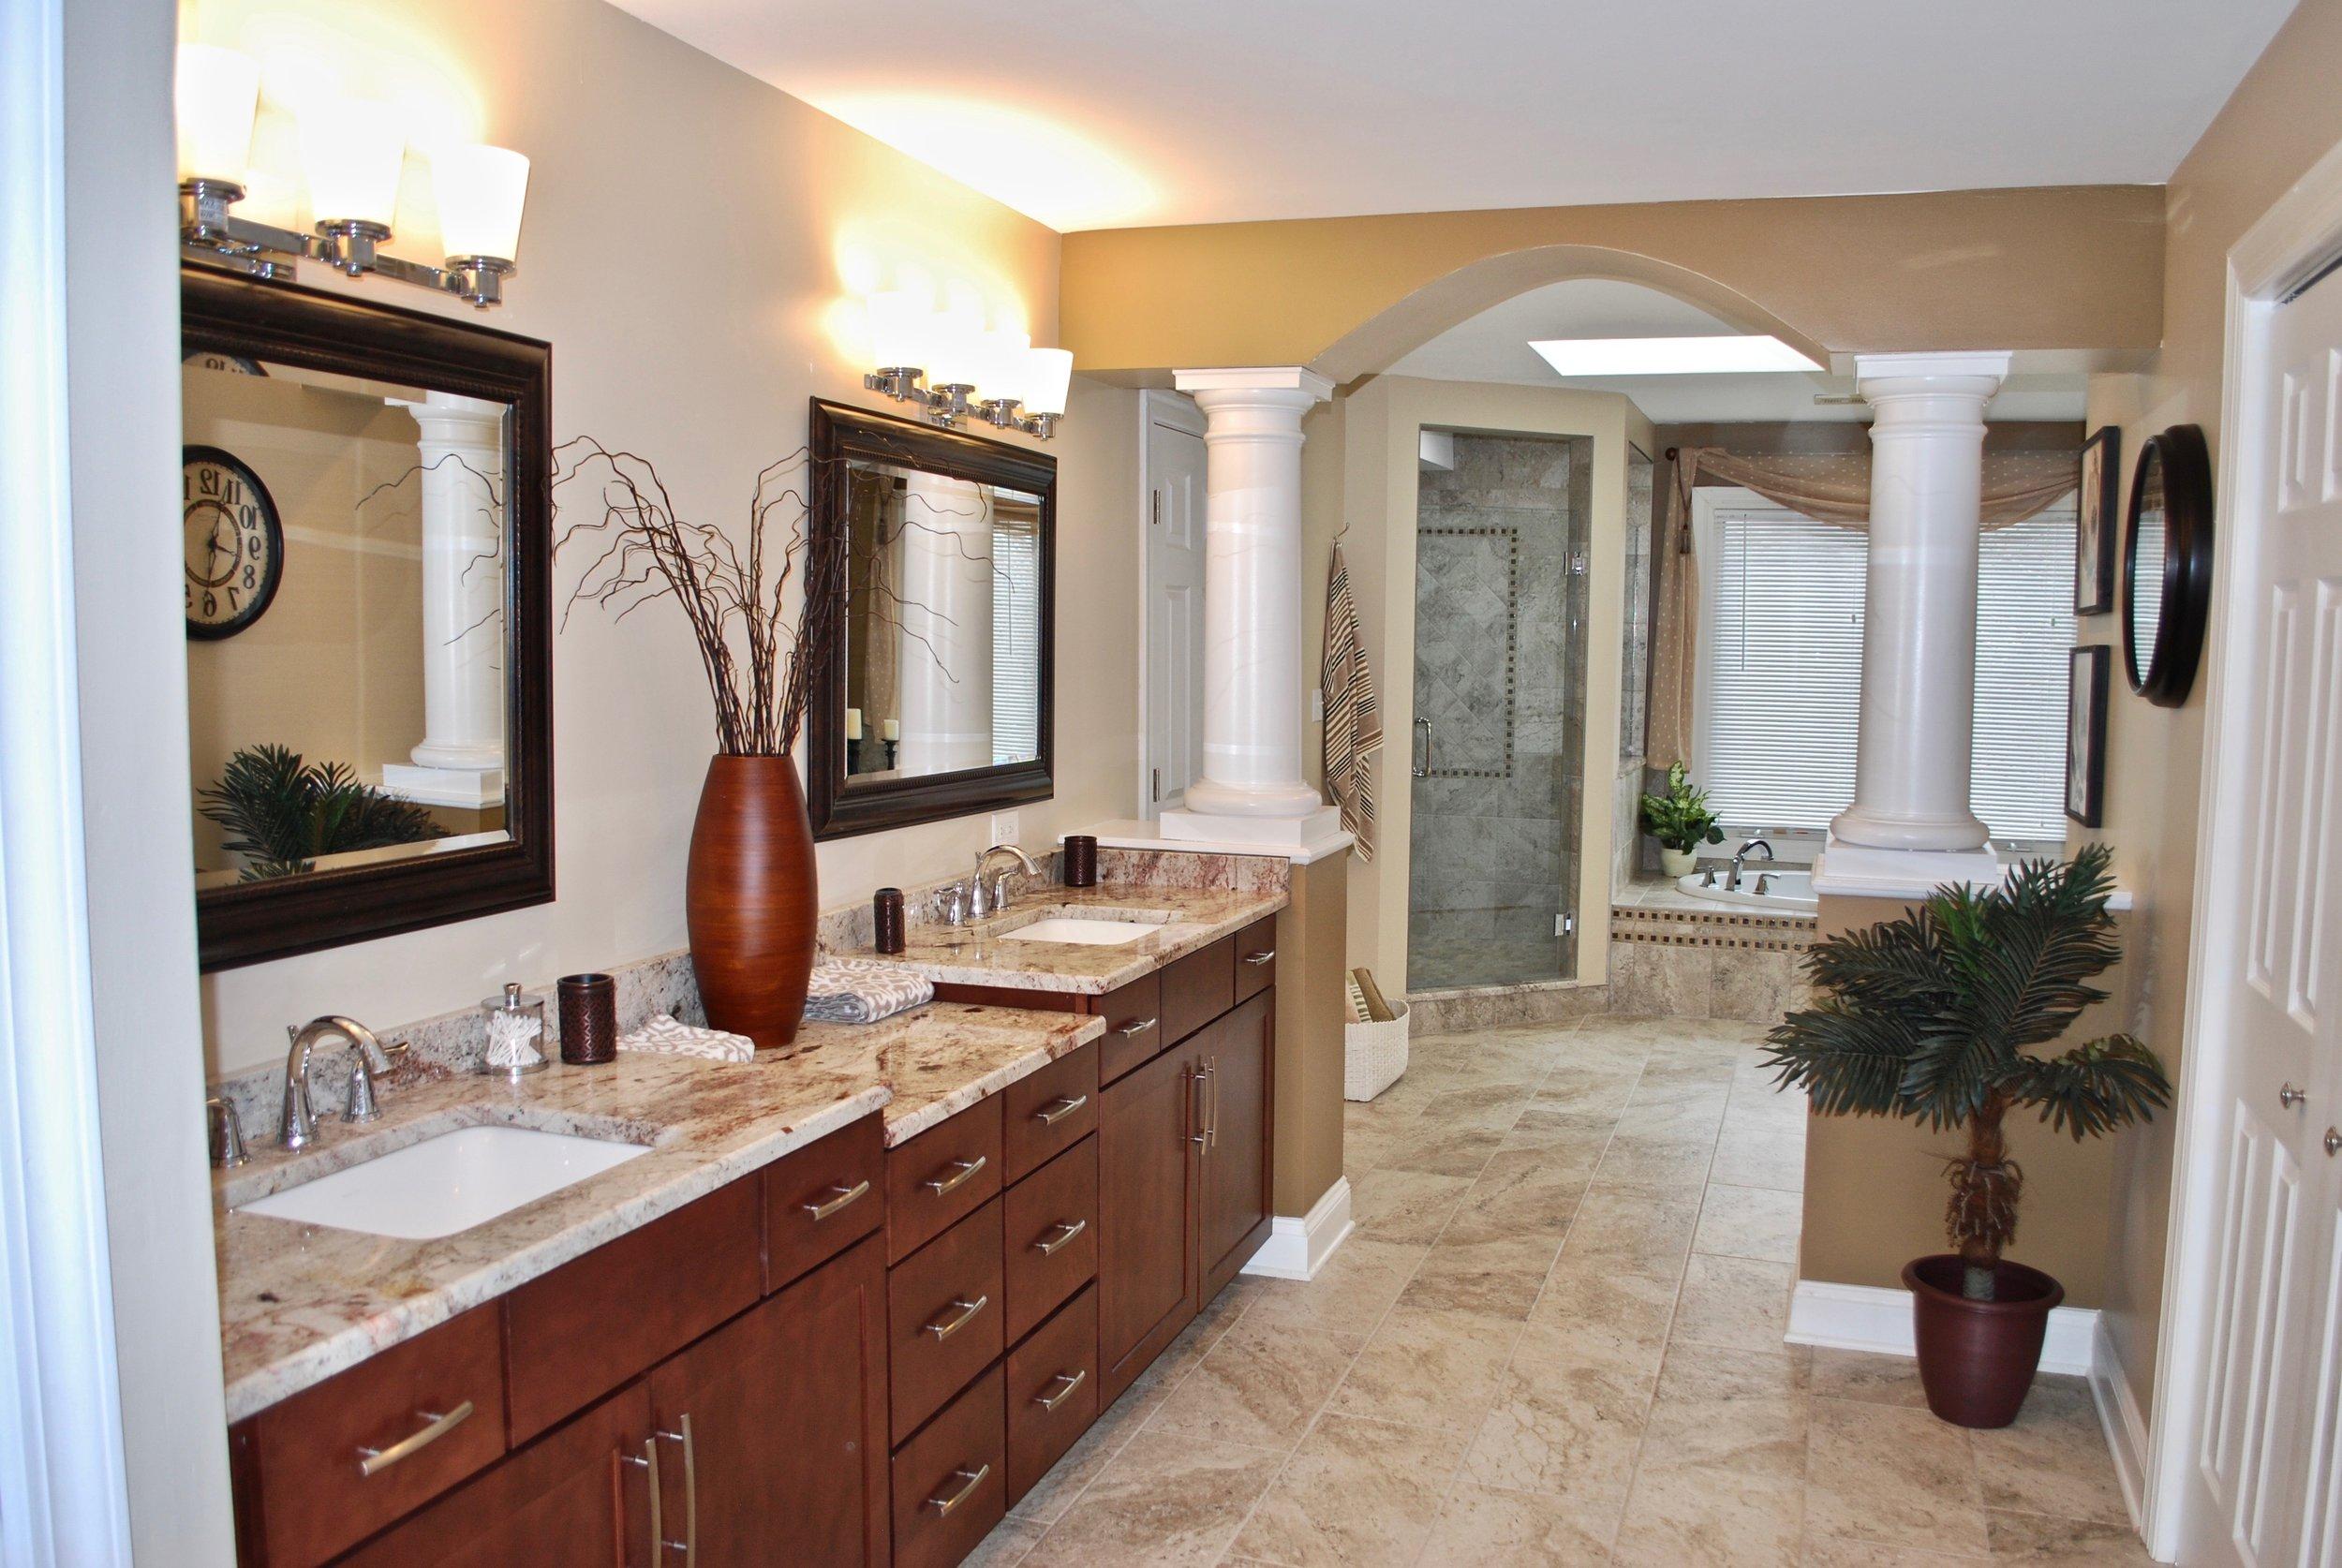 Geneva Illinois Bathroom Vanity Replacement & Updating